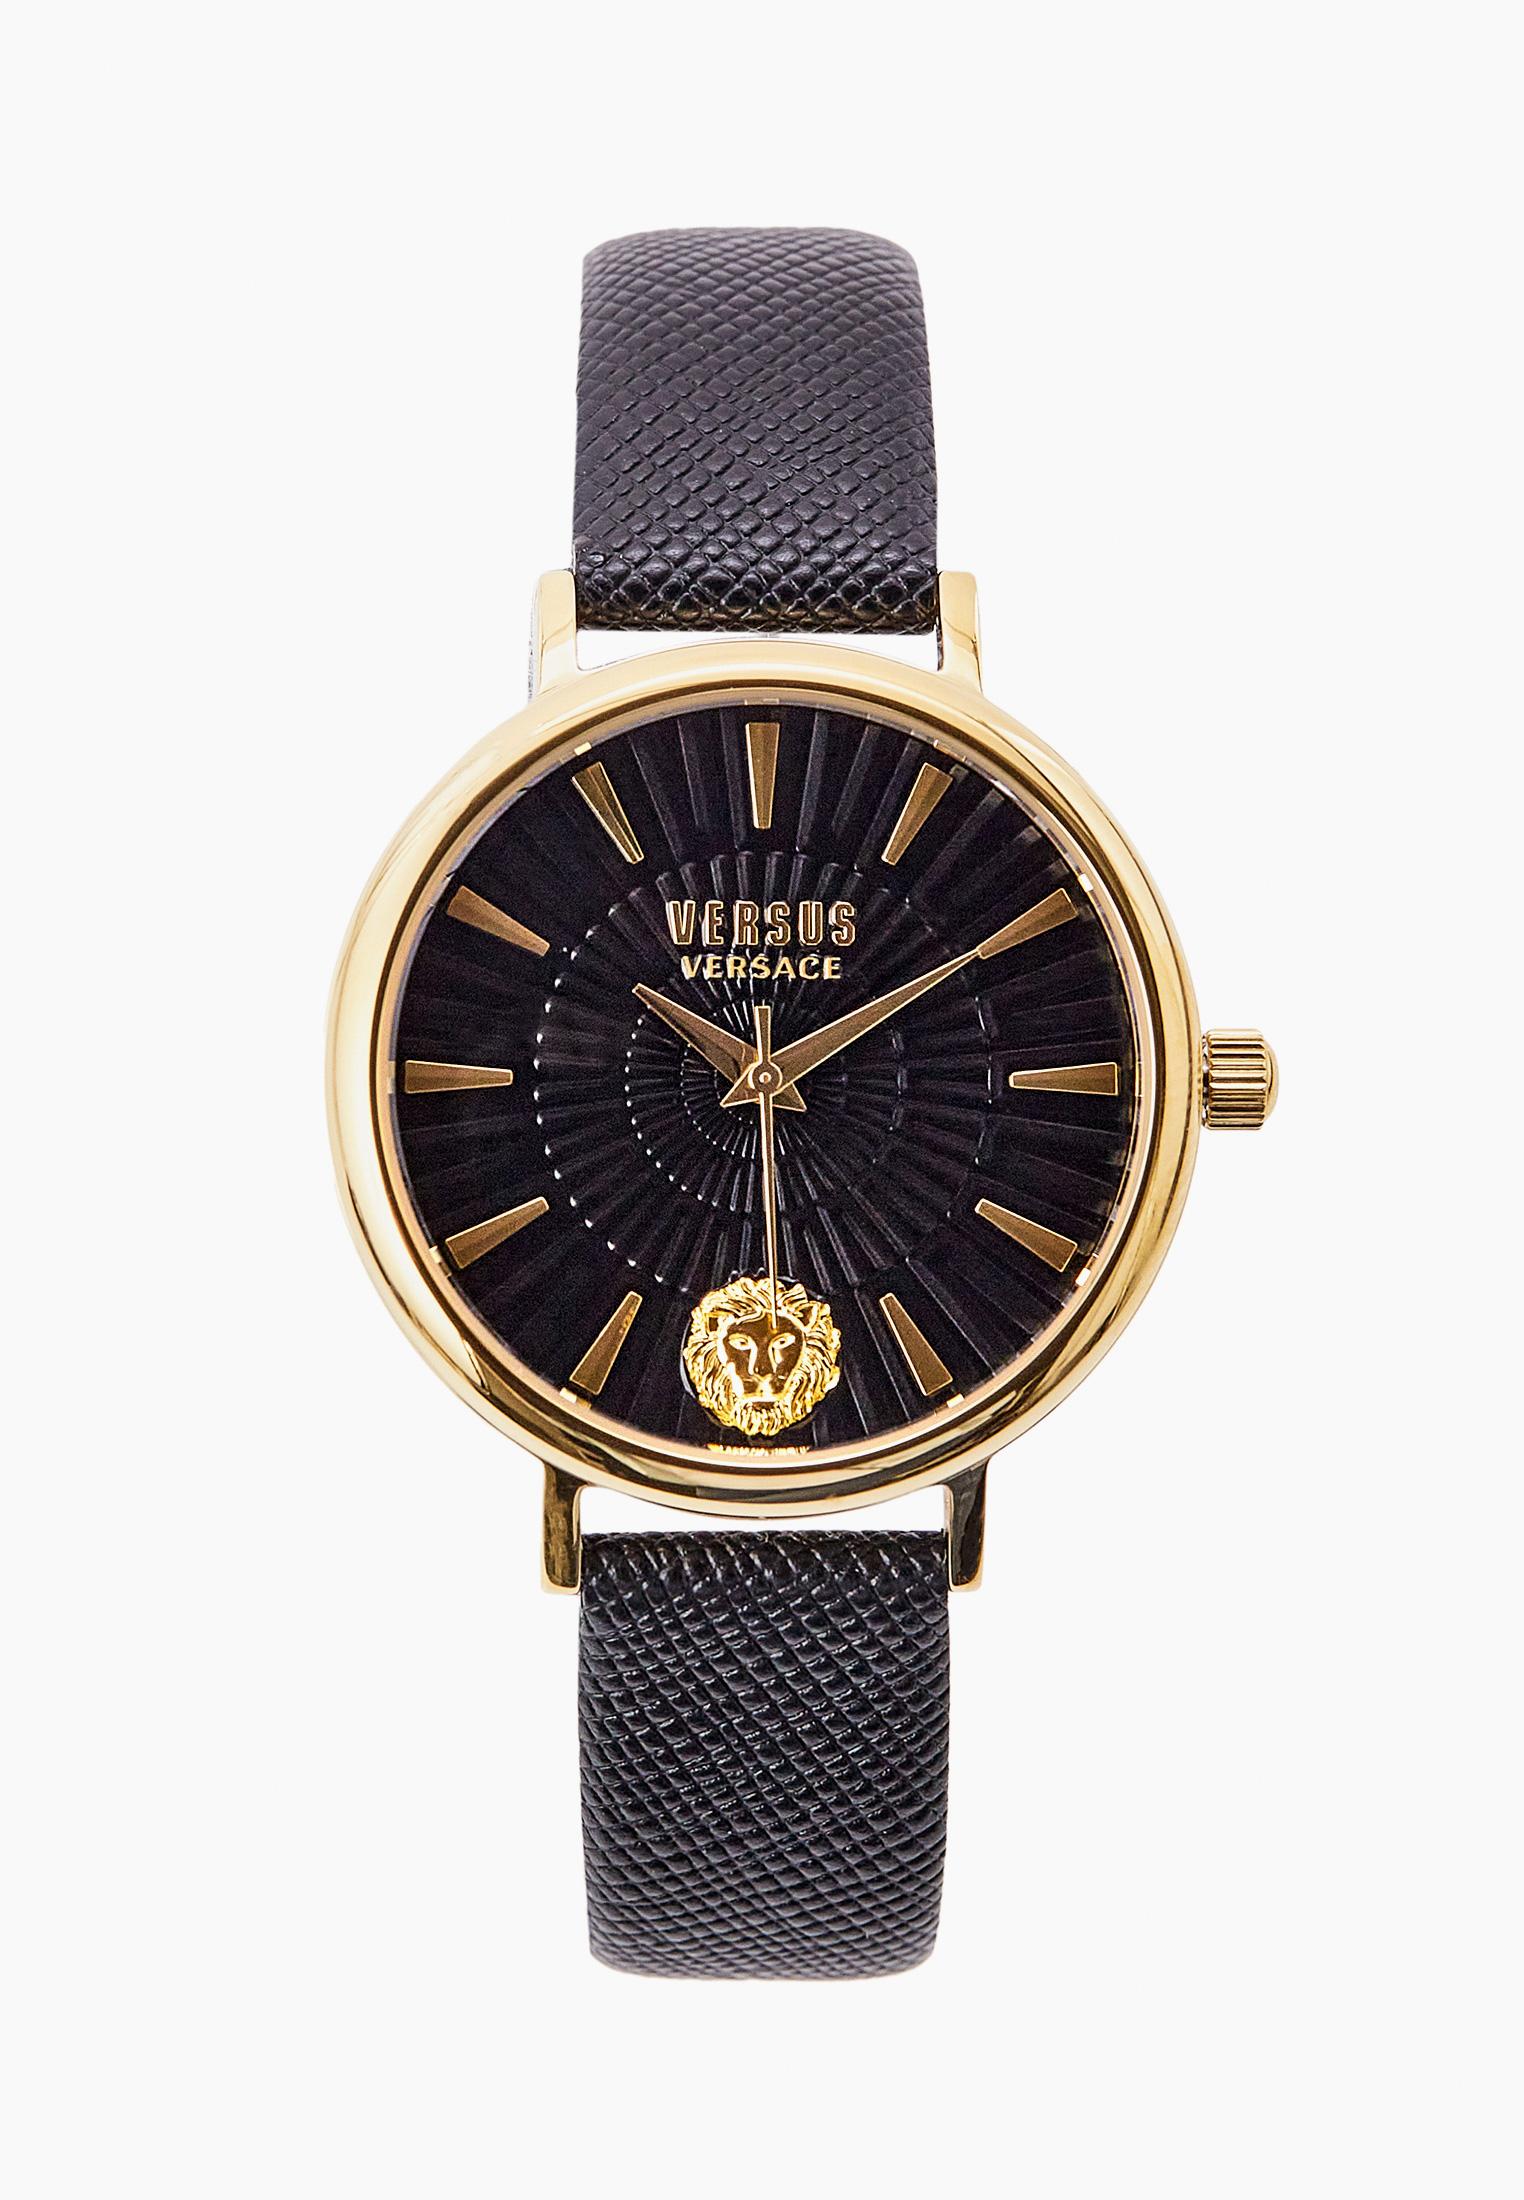 Часы Versus Versace Часы Versus Versace